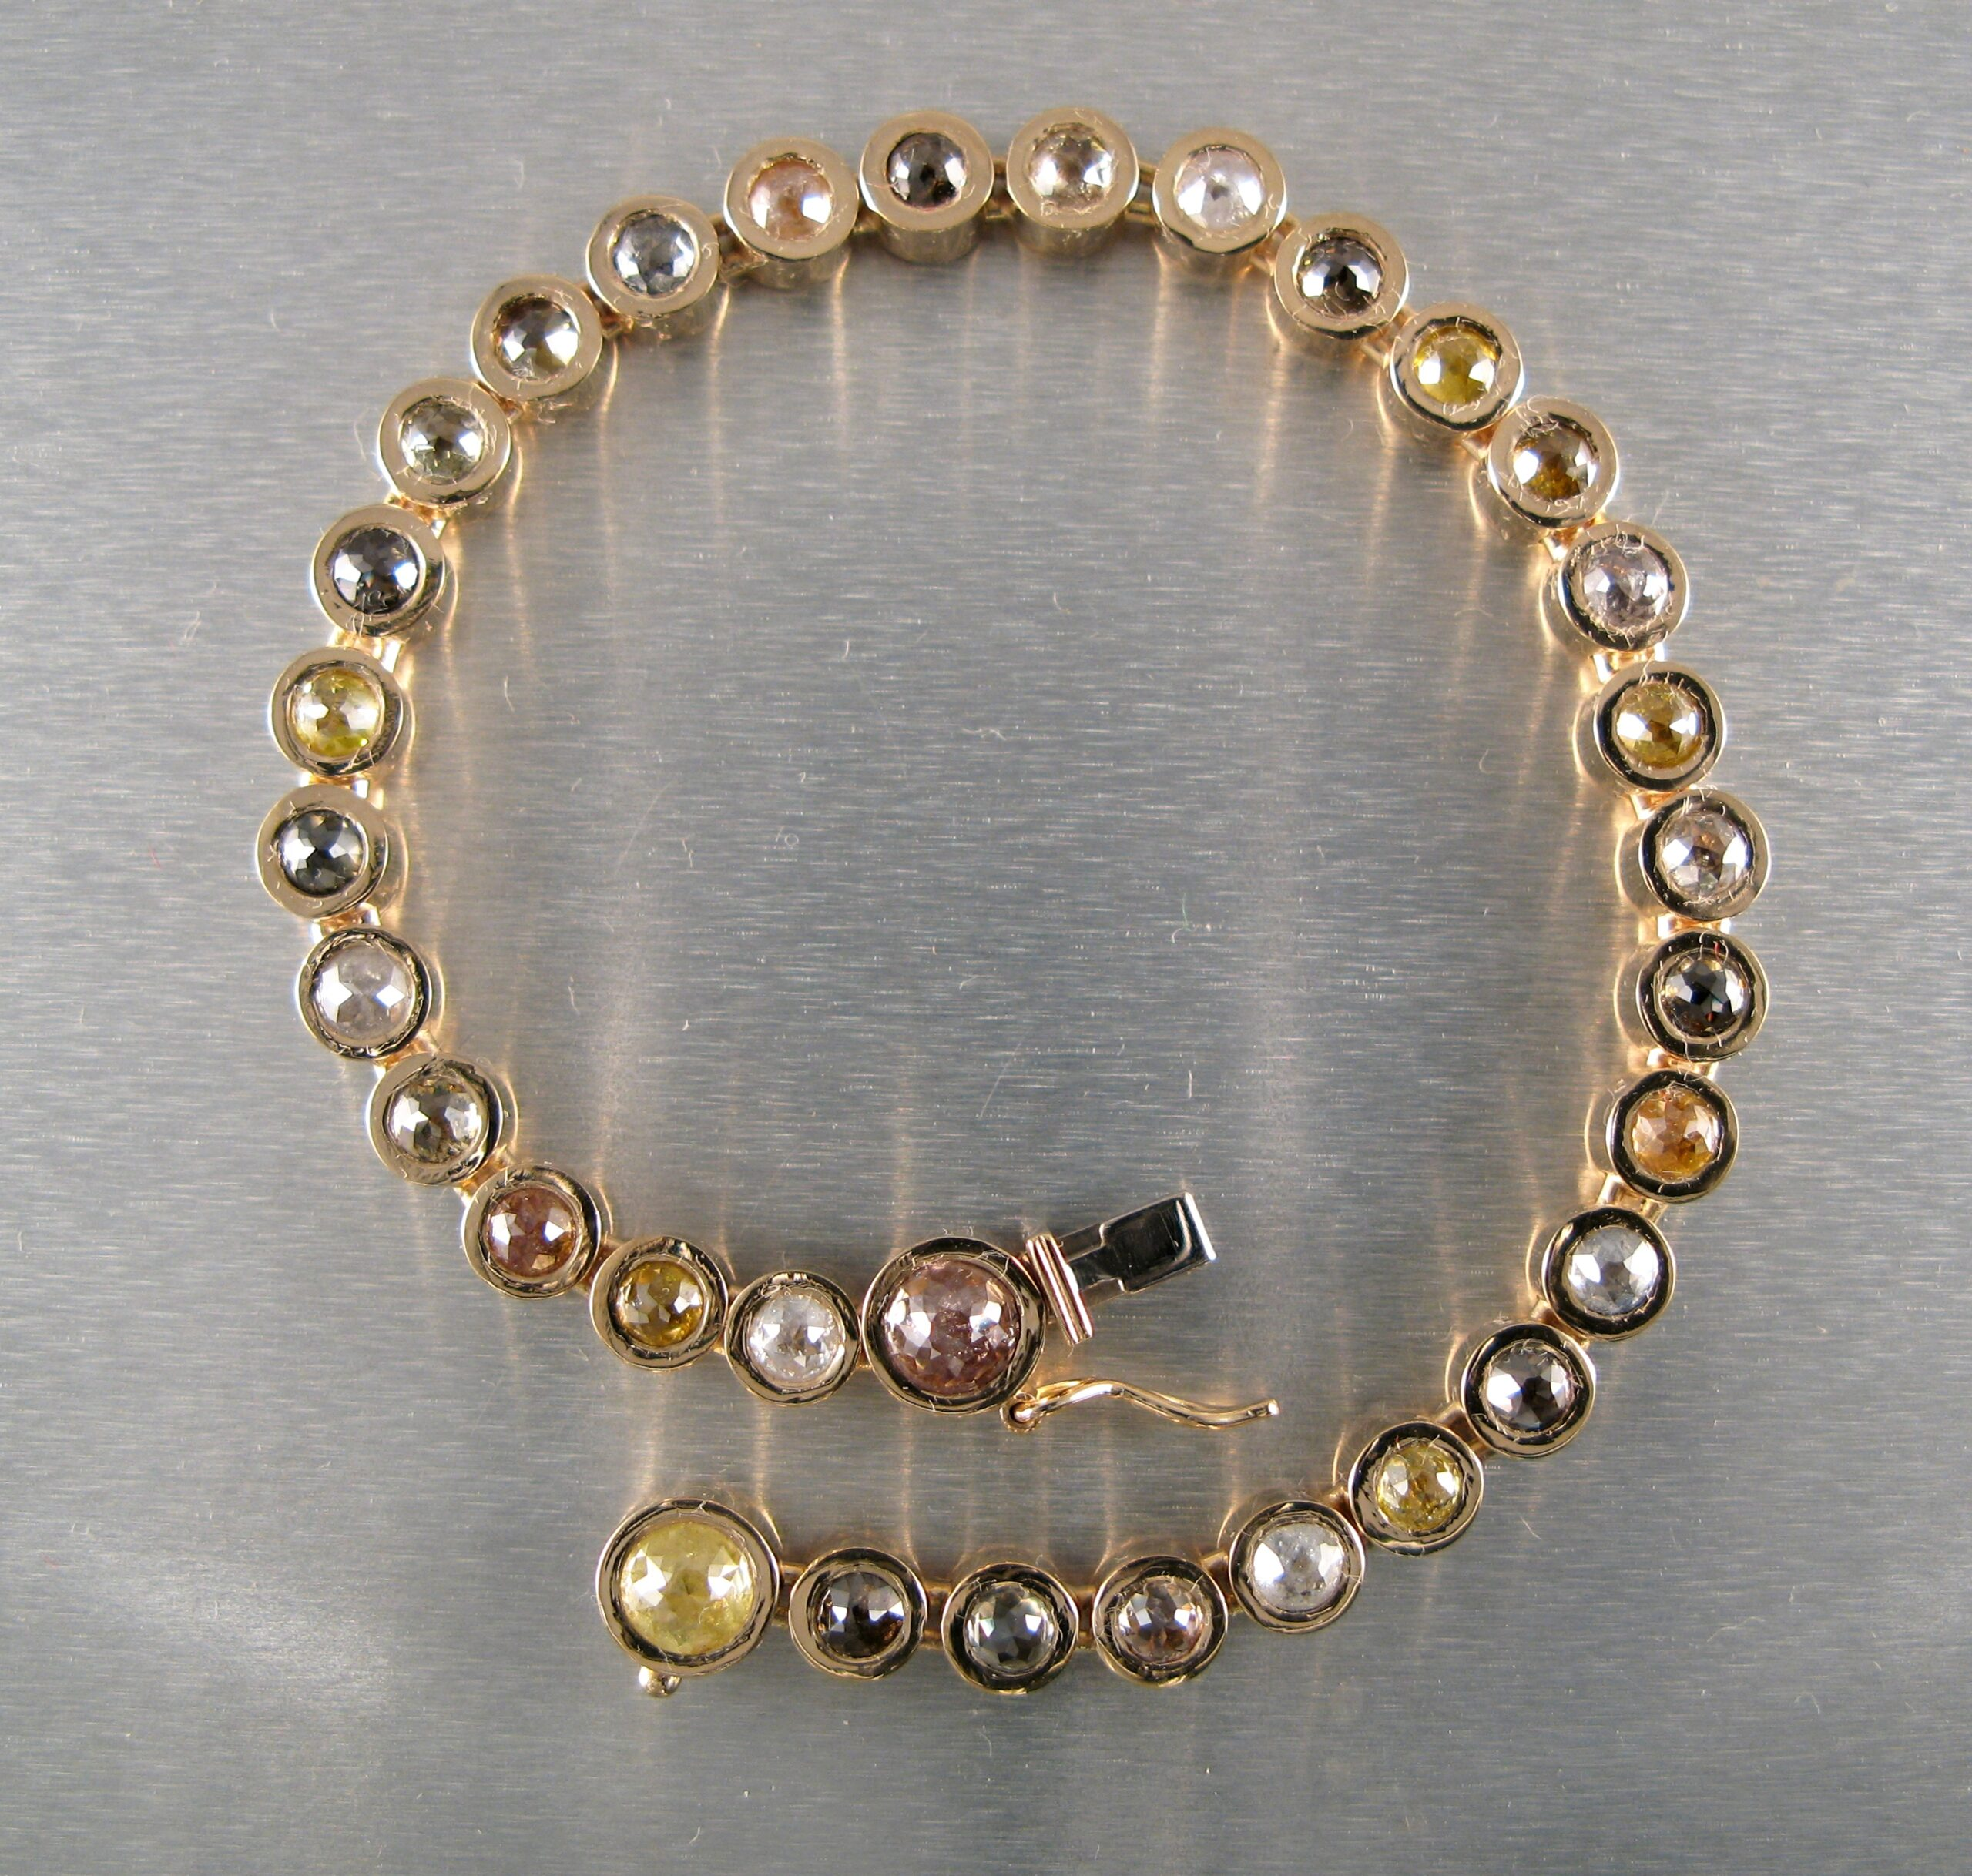 Ledat armband i guld med rosenslipade naturfärgade diamanter.